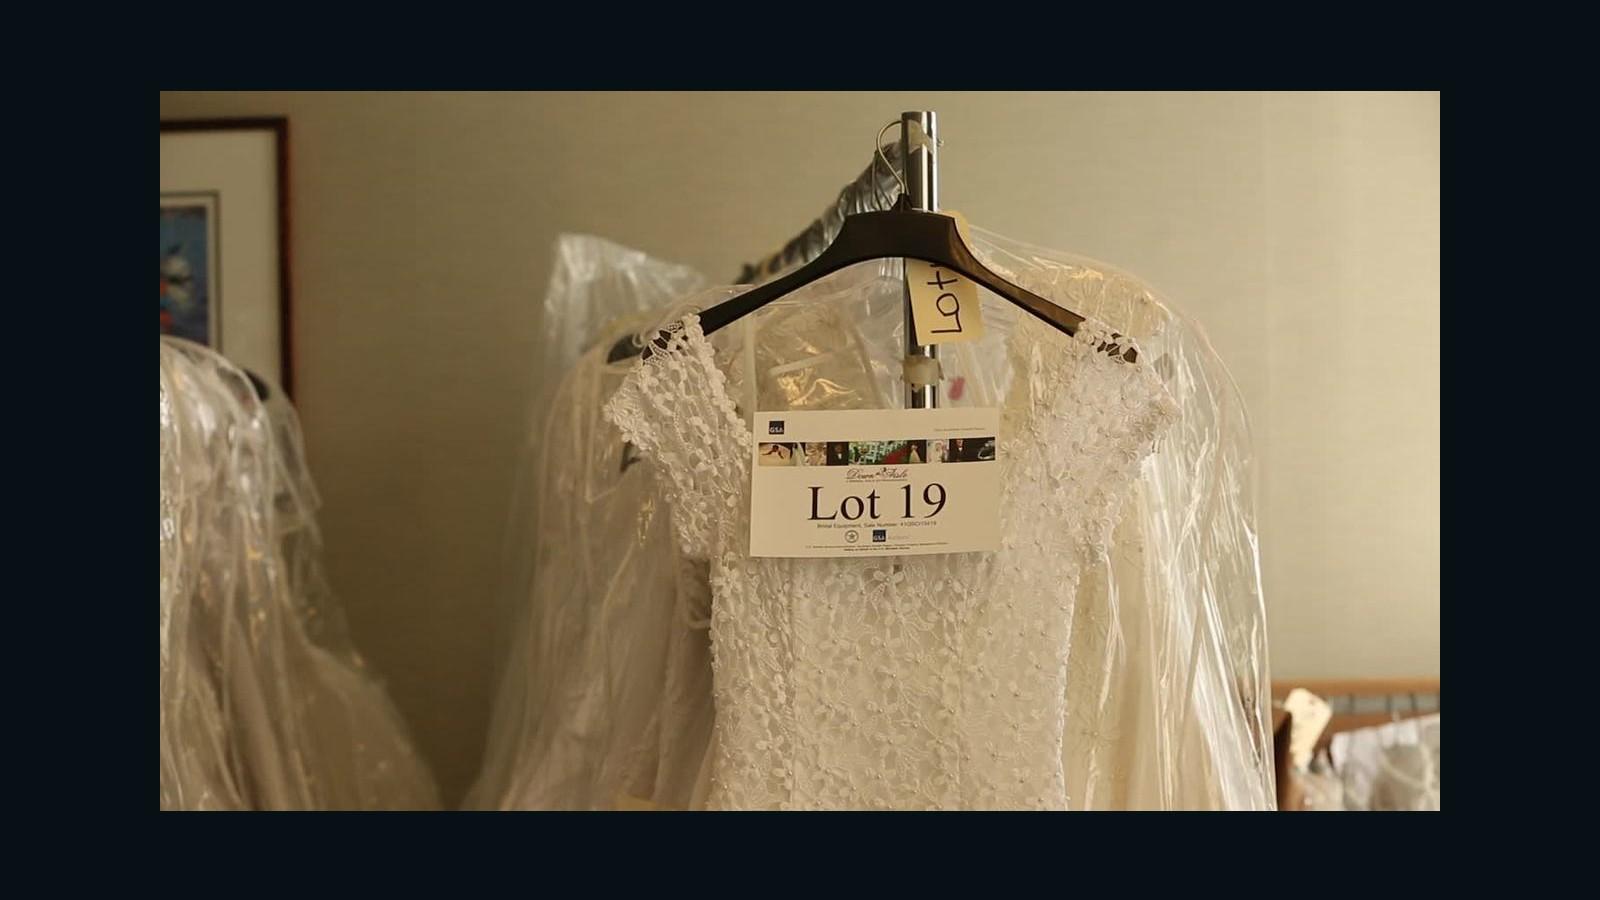 Drug bust leads to wedding dress sale - CNN Video